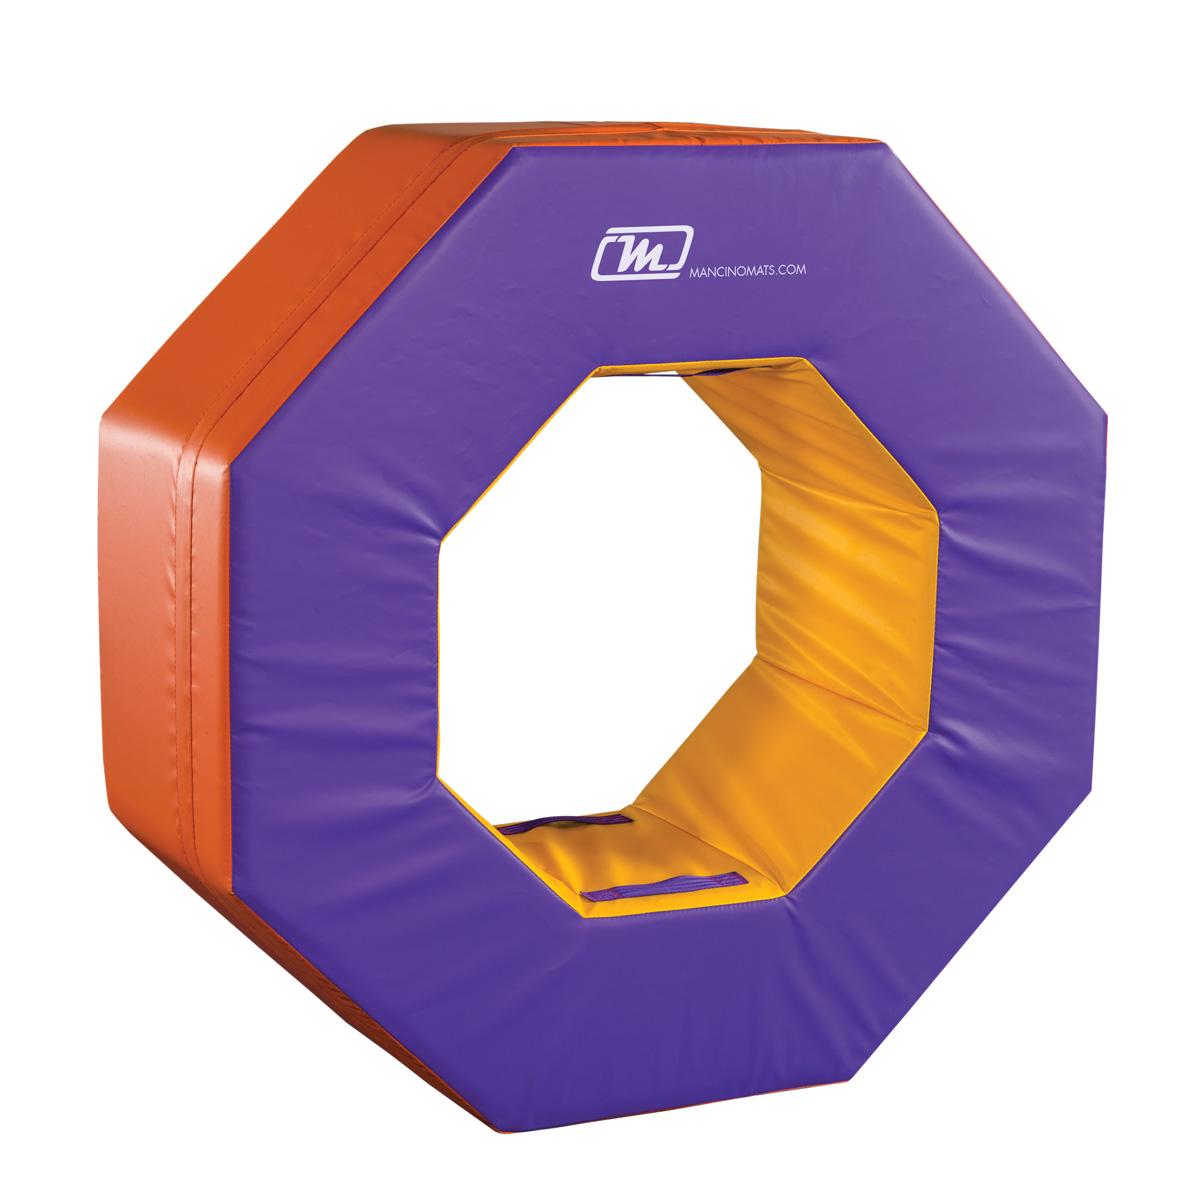 octagonal donuts mat mancino mini ball pool